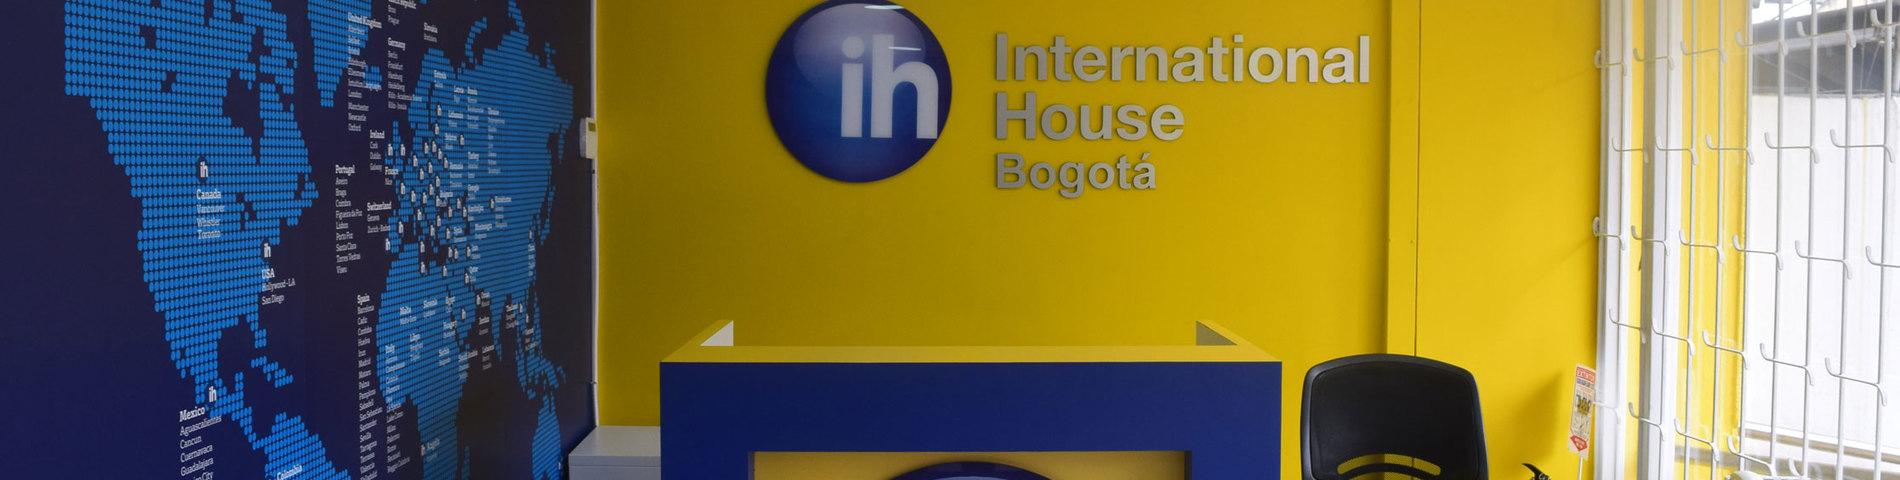 International House Bogota kép 1